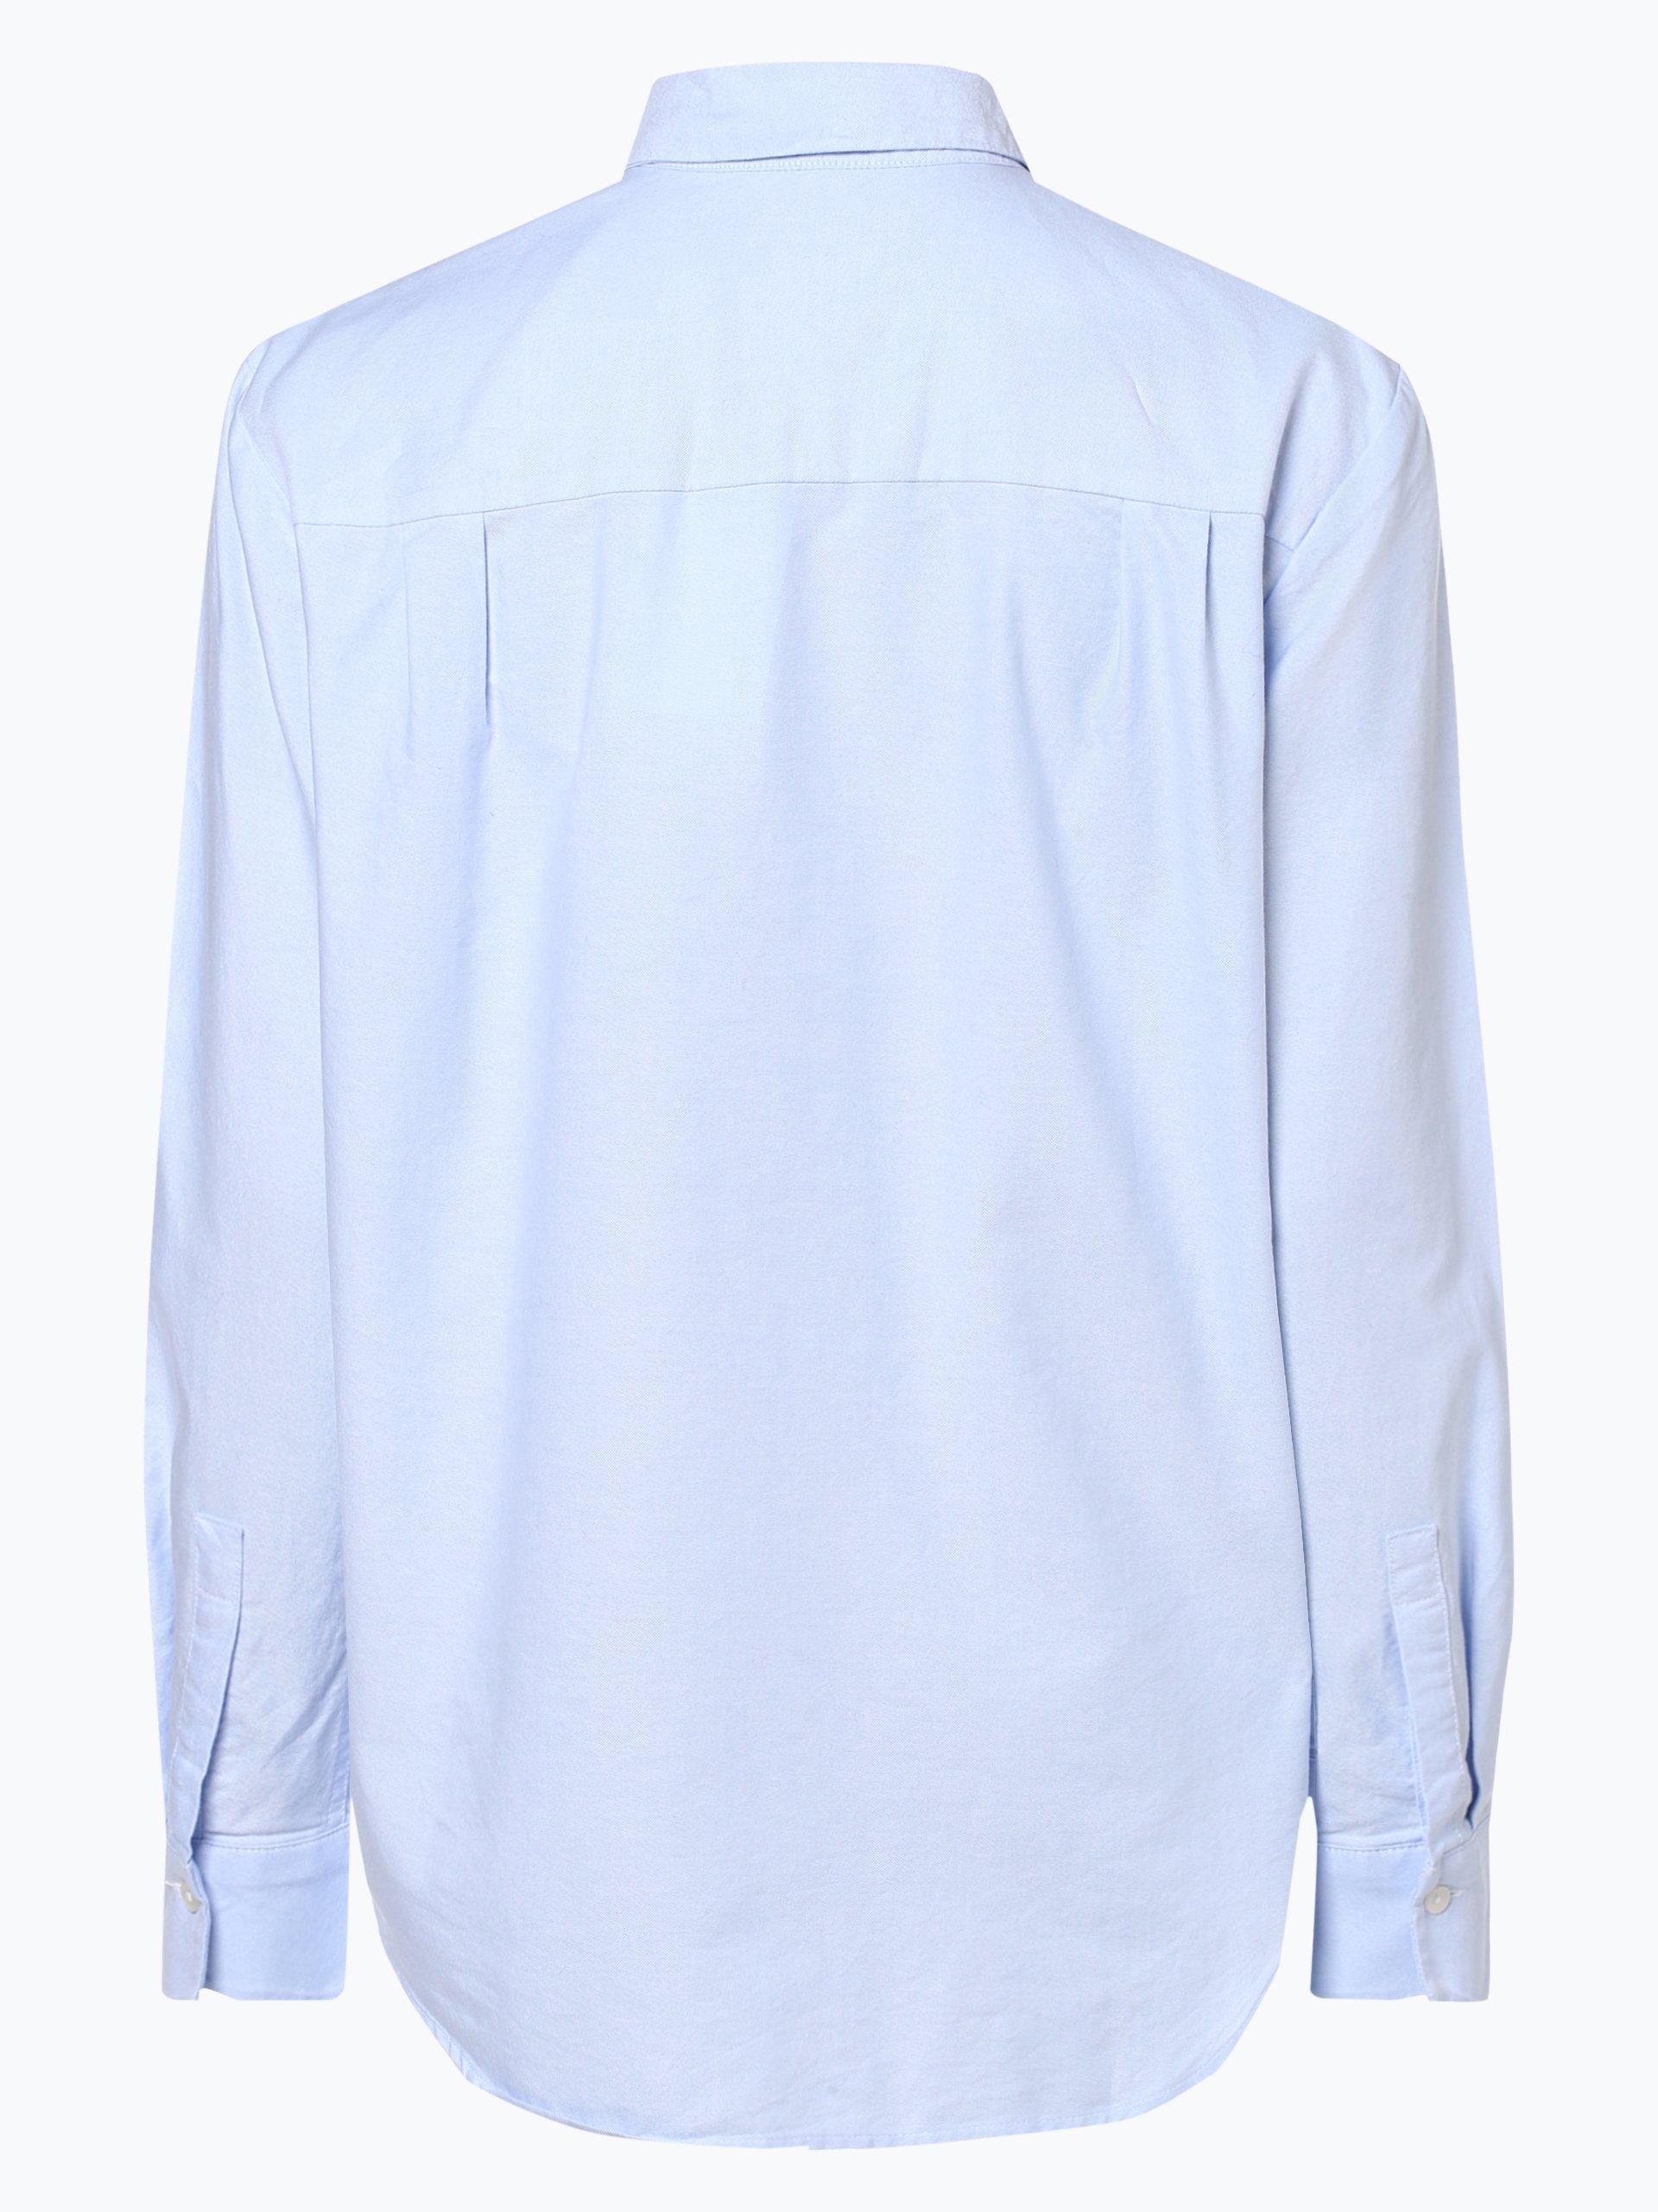 Tommy Hilfiger Damen Bluse - Tommy Icons Girlfriend Shirt